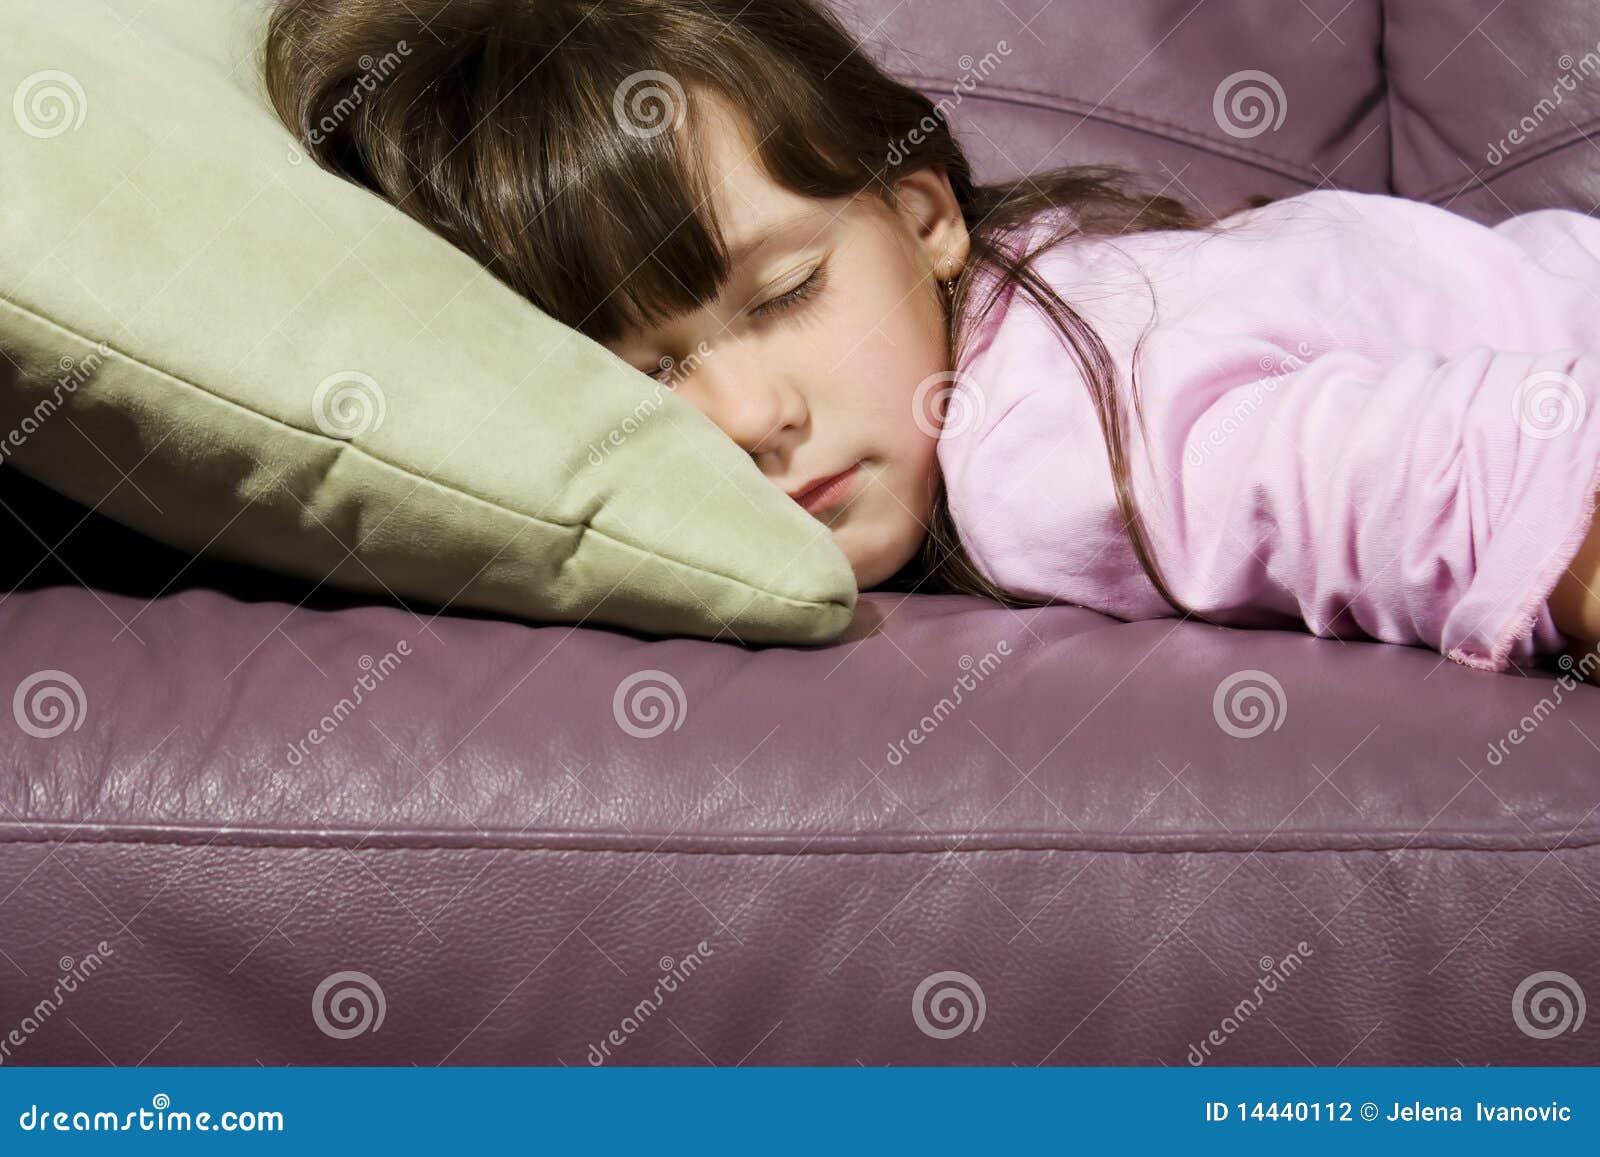 little girl asleep on couch stock photography